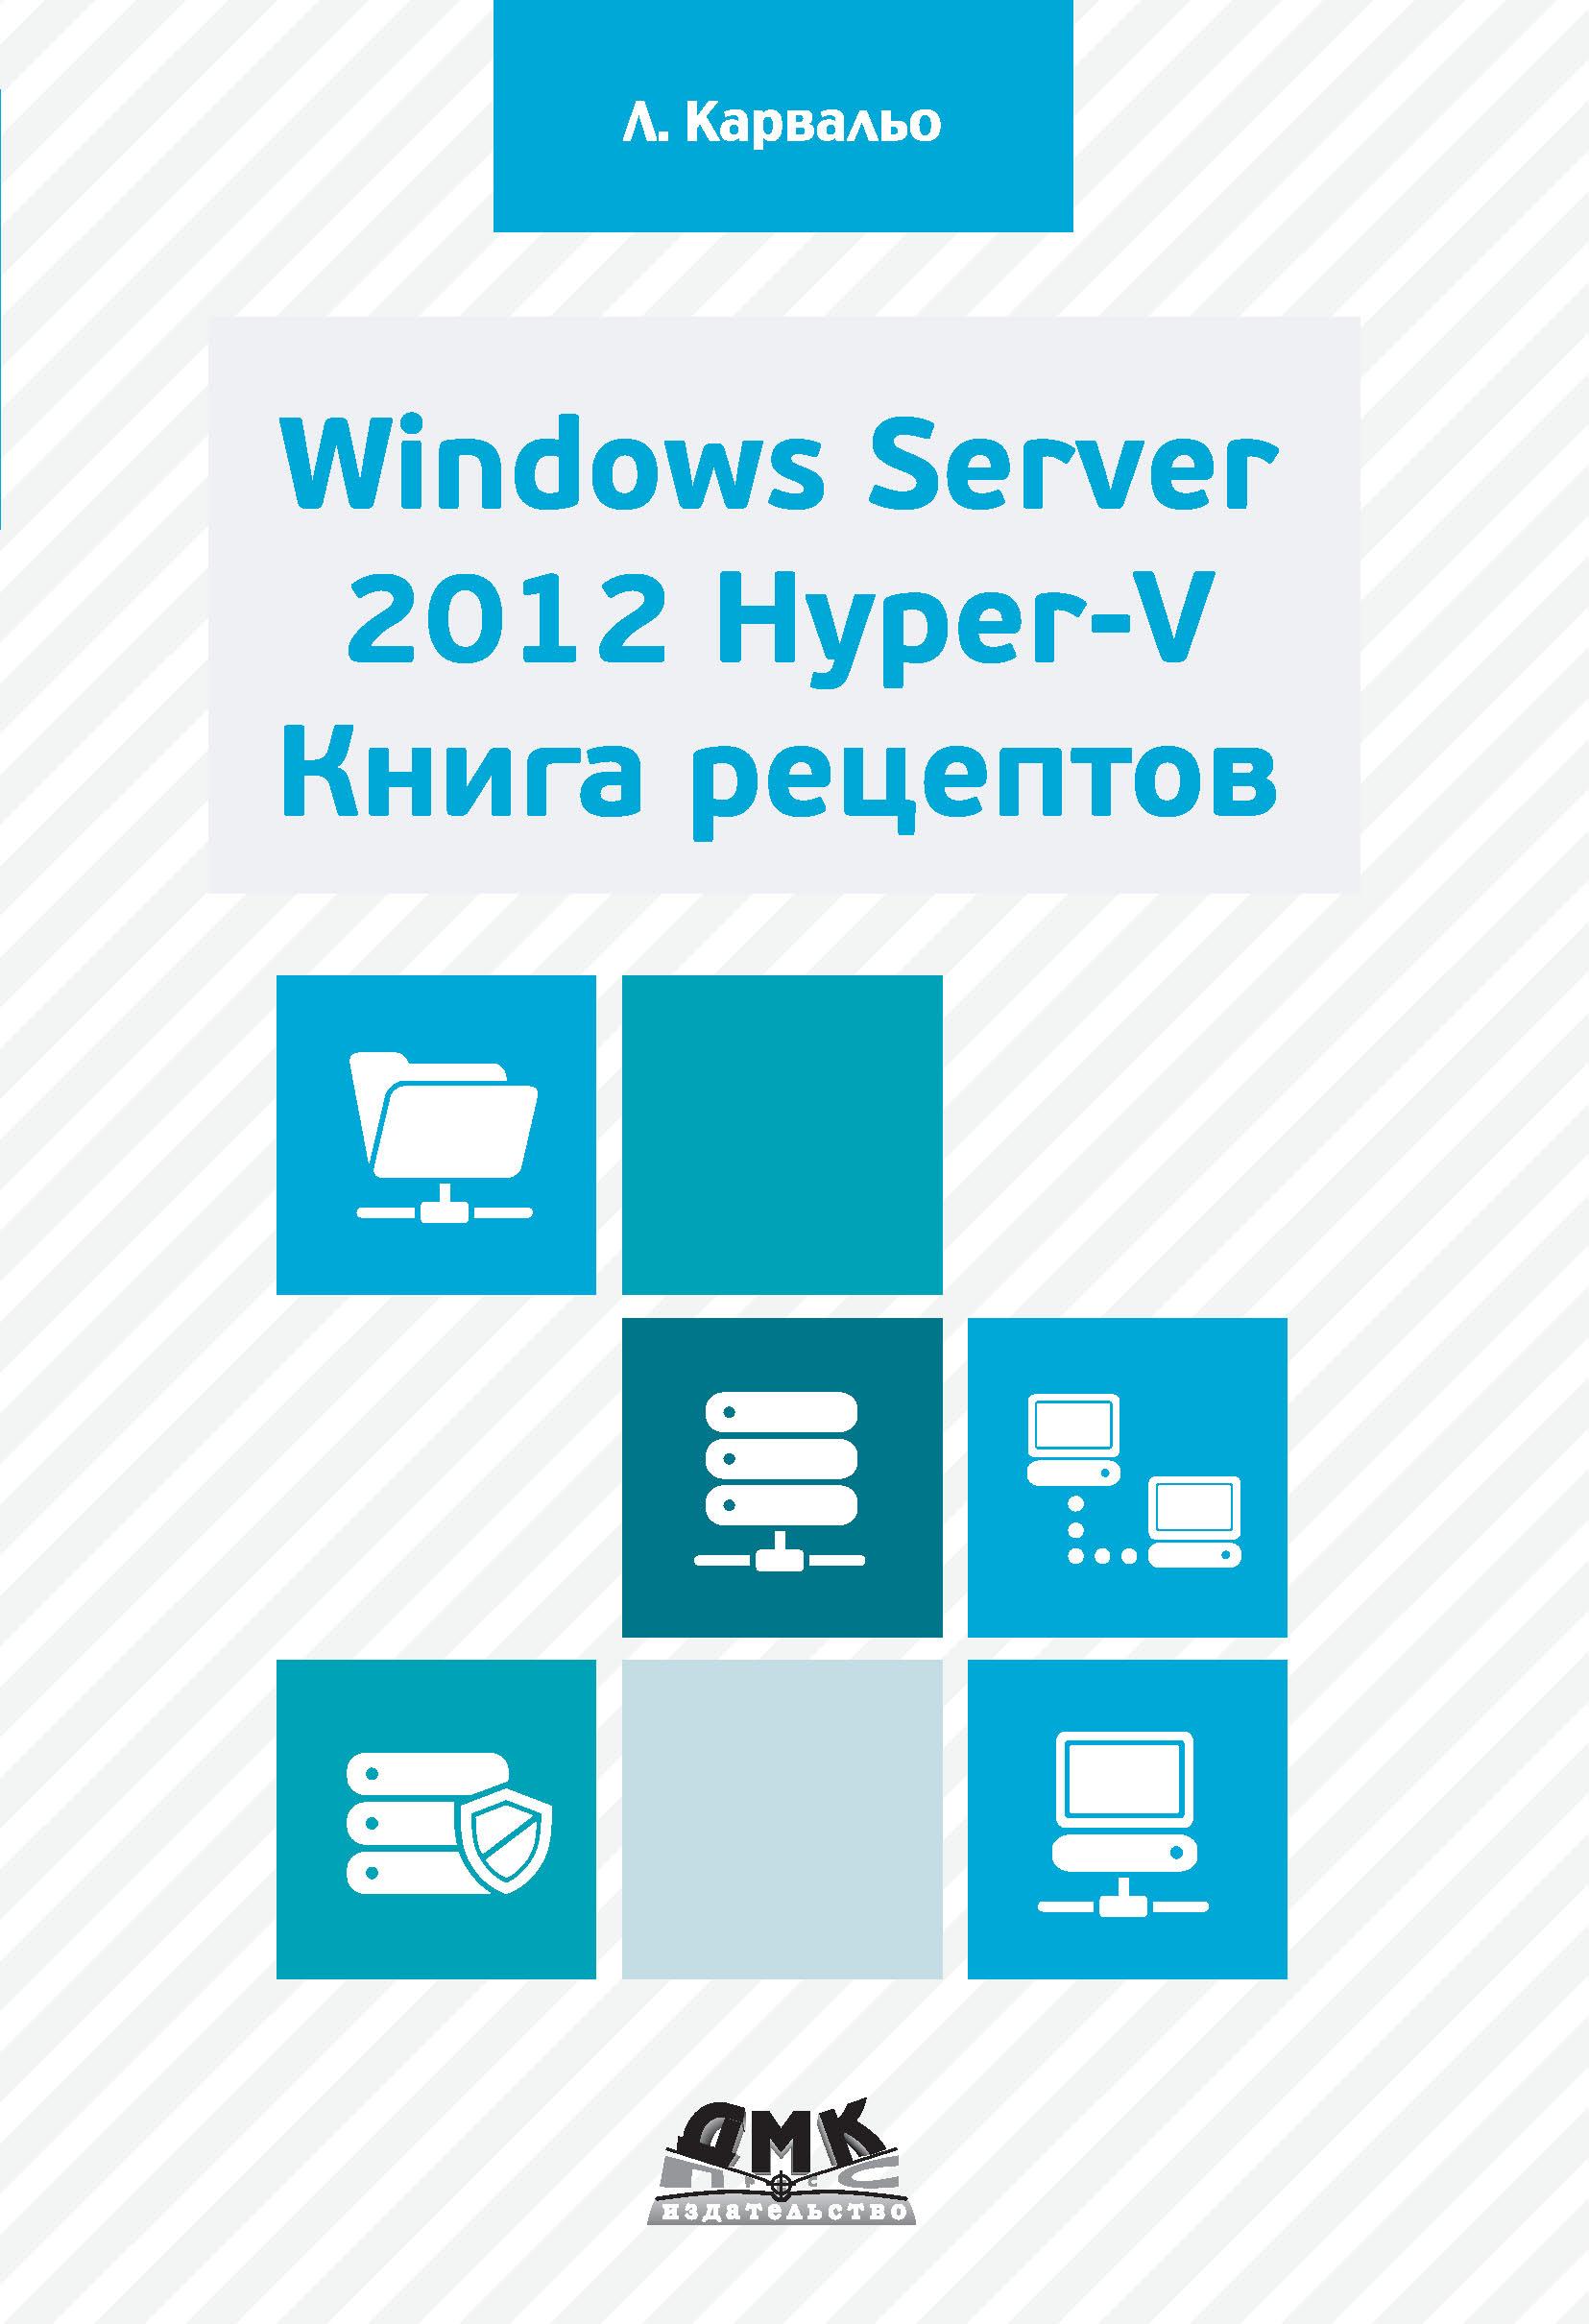 Леандро Карвальо Windows Server 2012 Hyper-V. Книга рецептов david elfassy mastering microsoft exchange server 2013